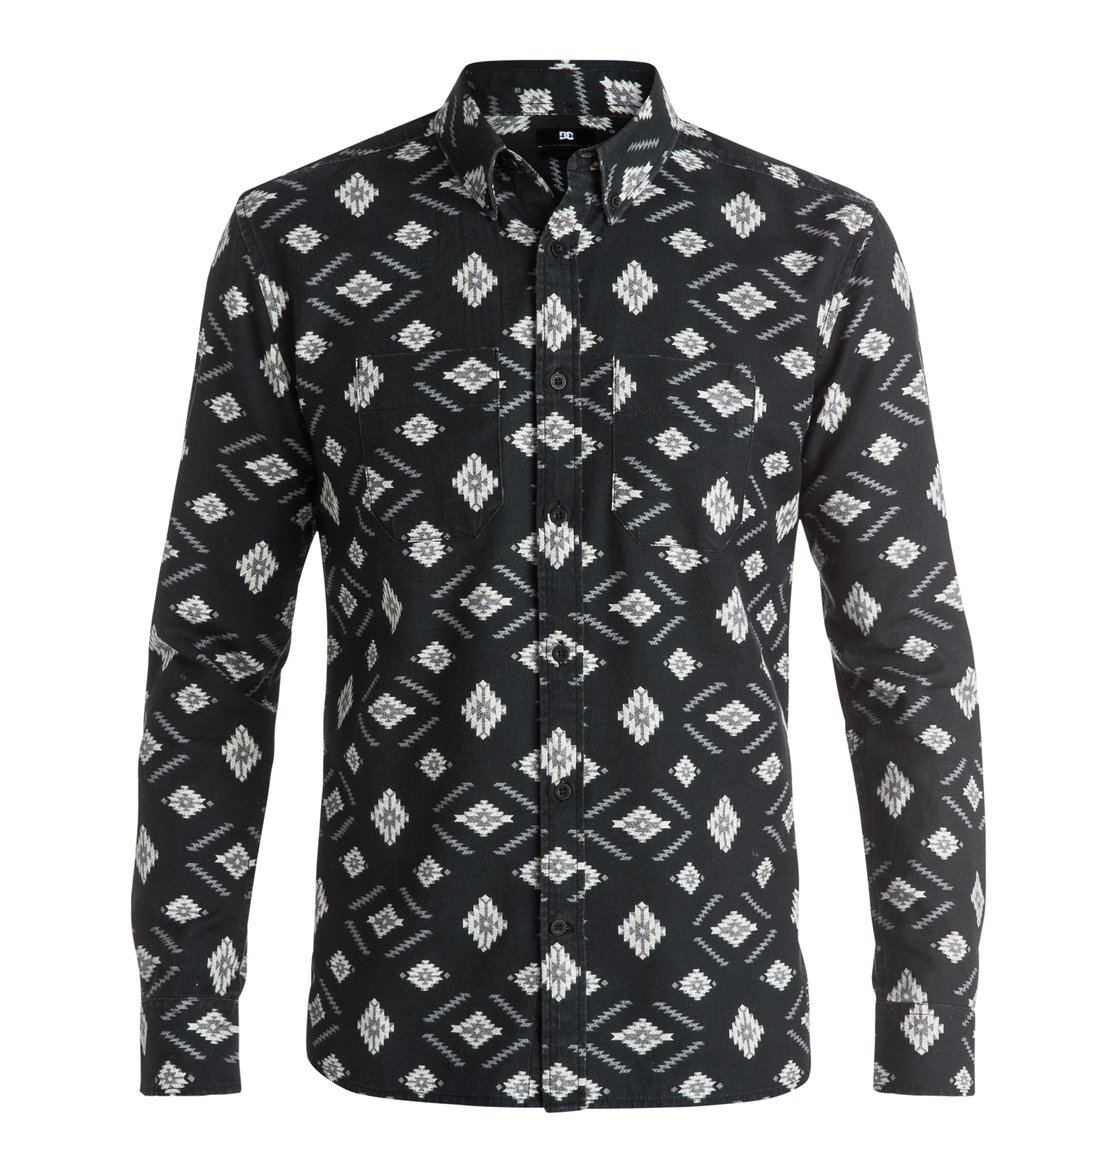 Рубашка Bowen Dale Flannel с длинным рукавом рубашка с длинным рукавом cyril flannel